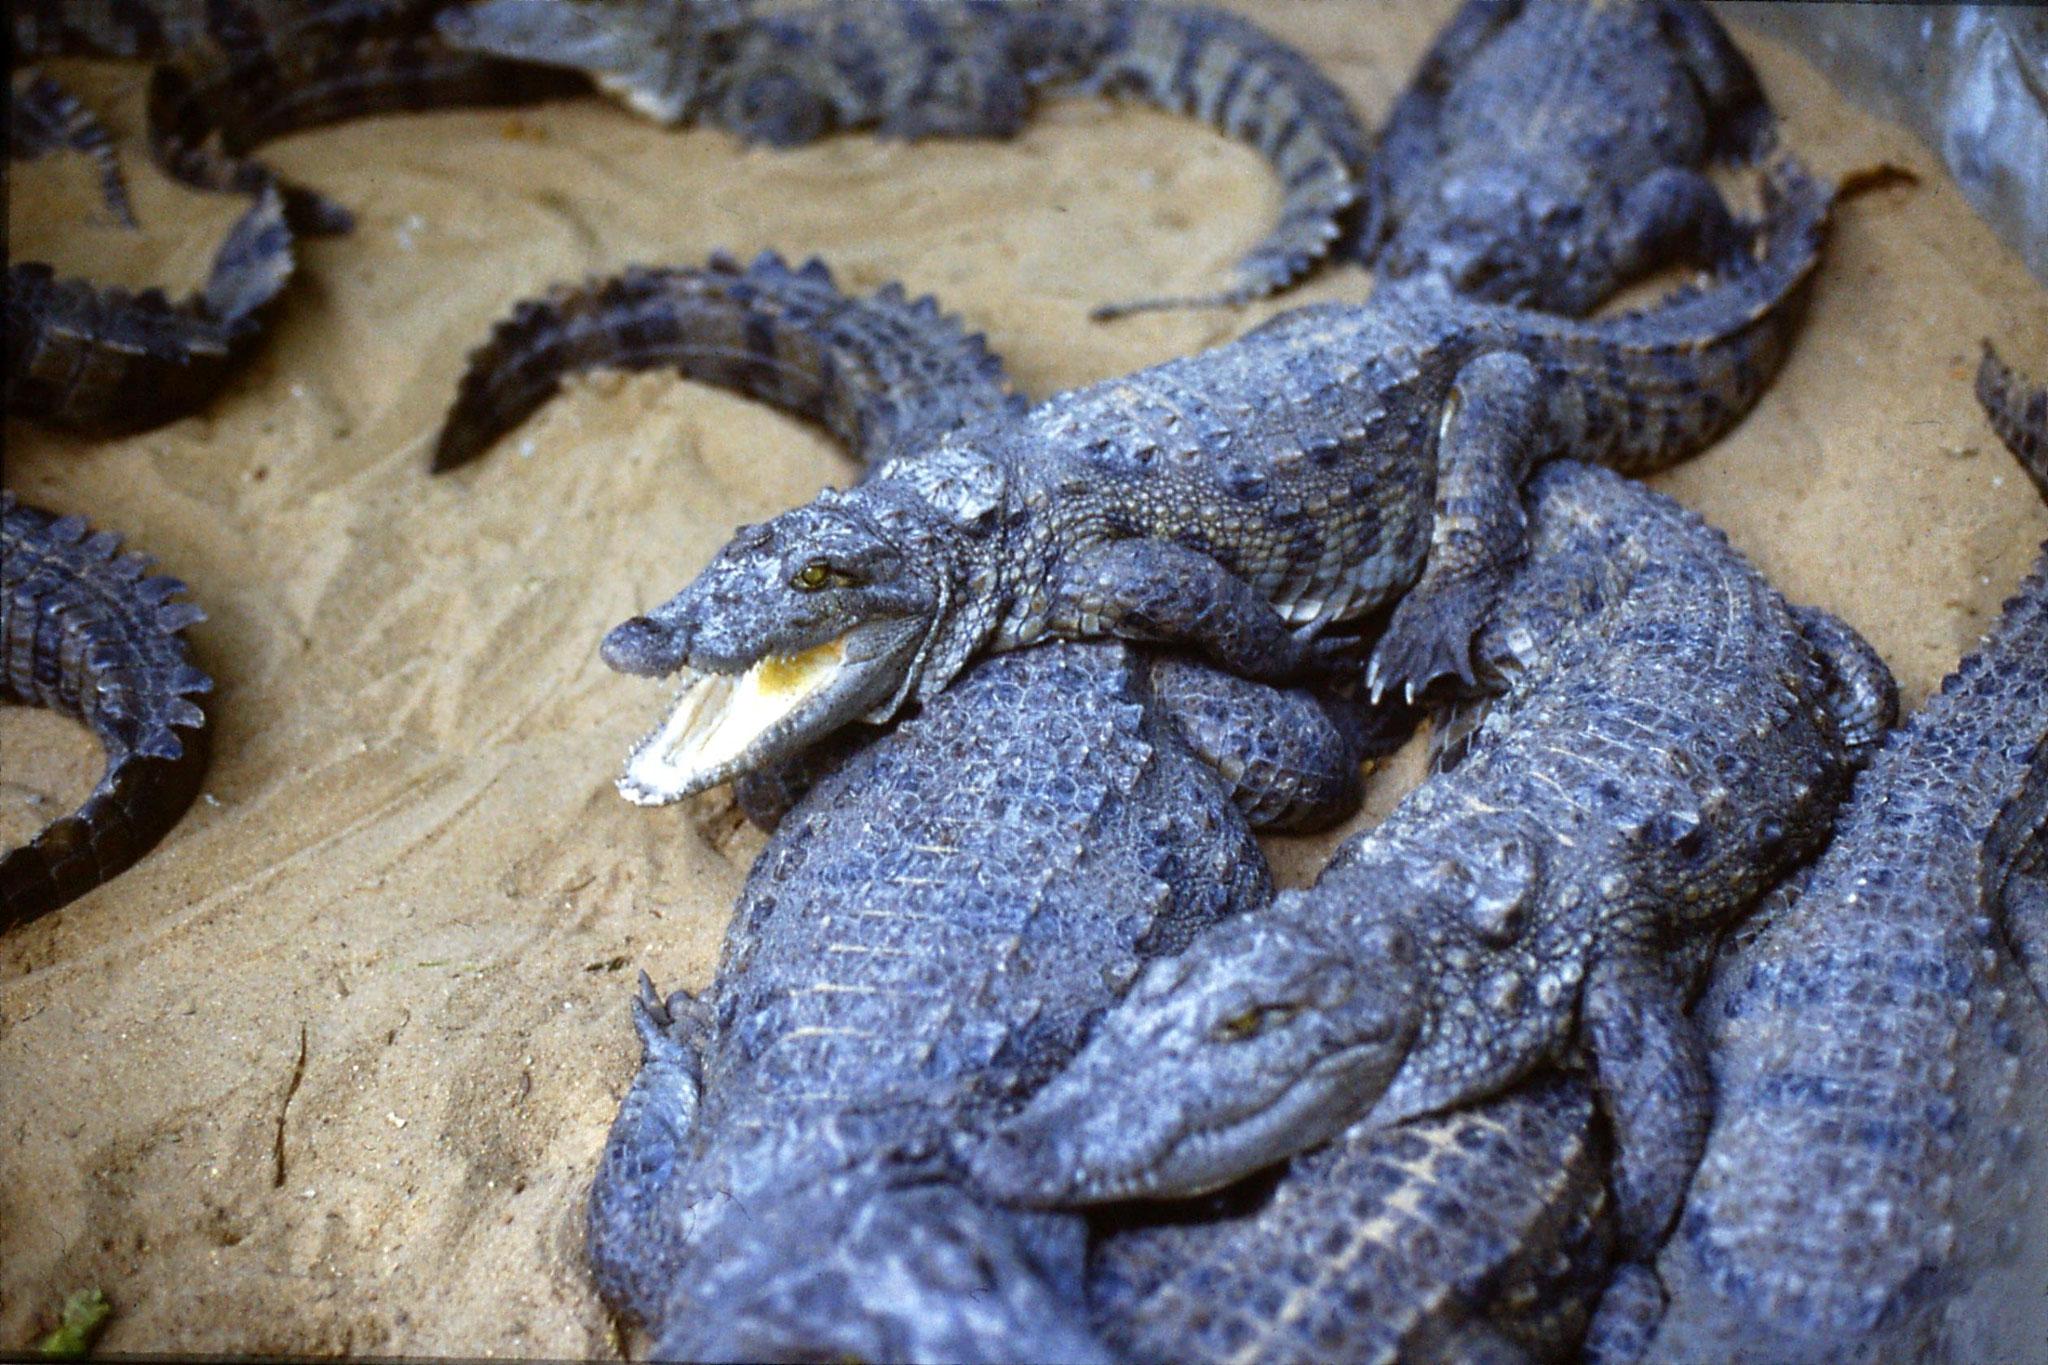 19/1/1990: 22: Madras crocodile park. Mugger crocodiles